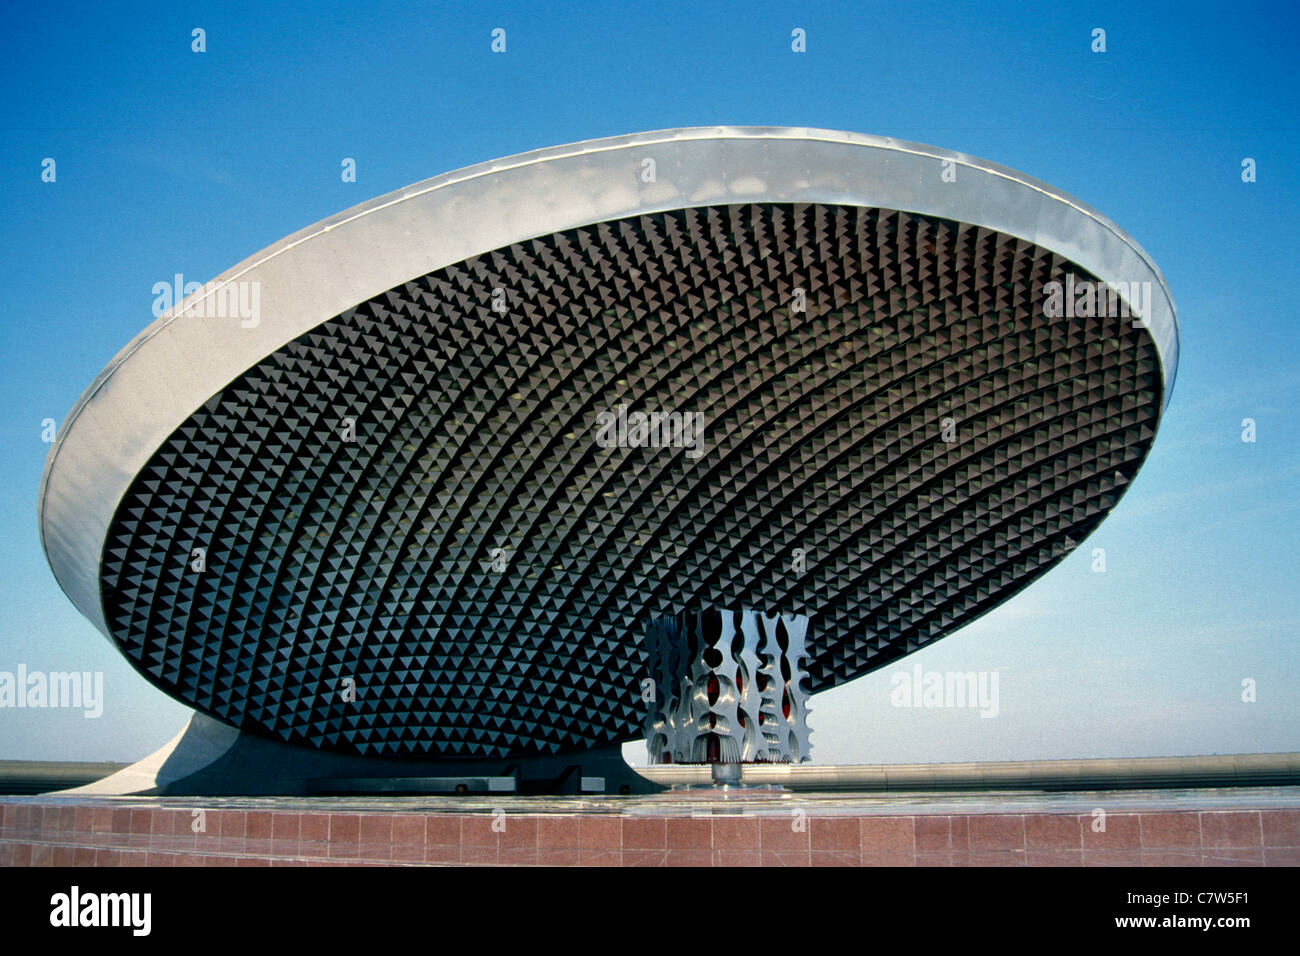 Irak, Baghdad, modern sculpture - Stock Image